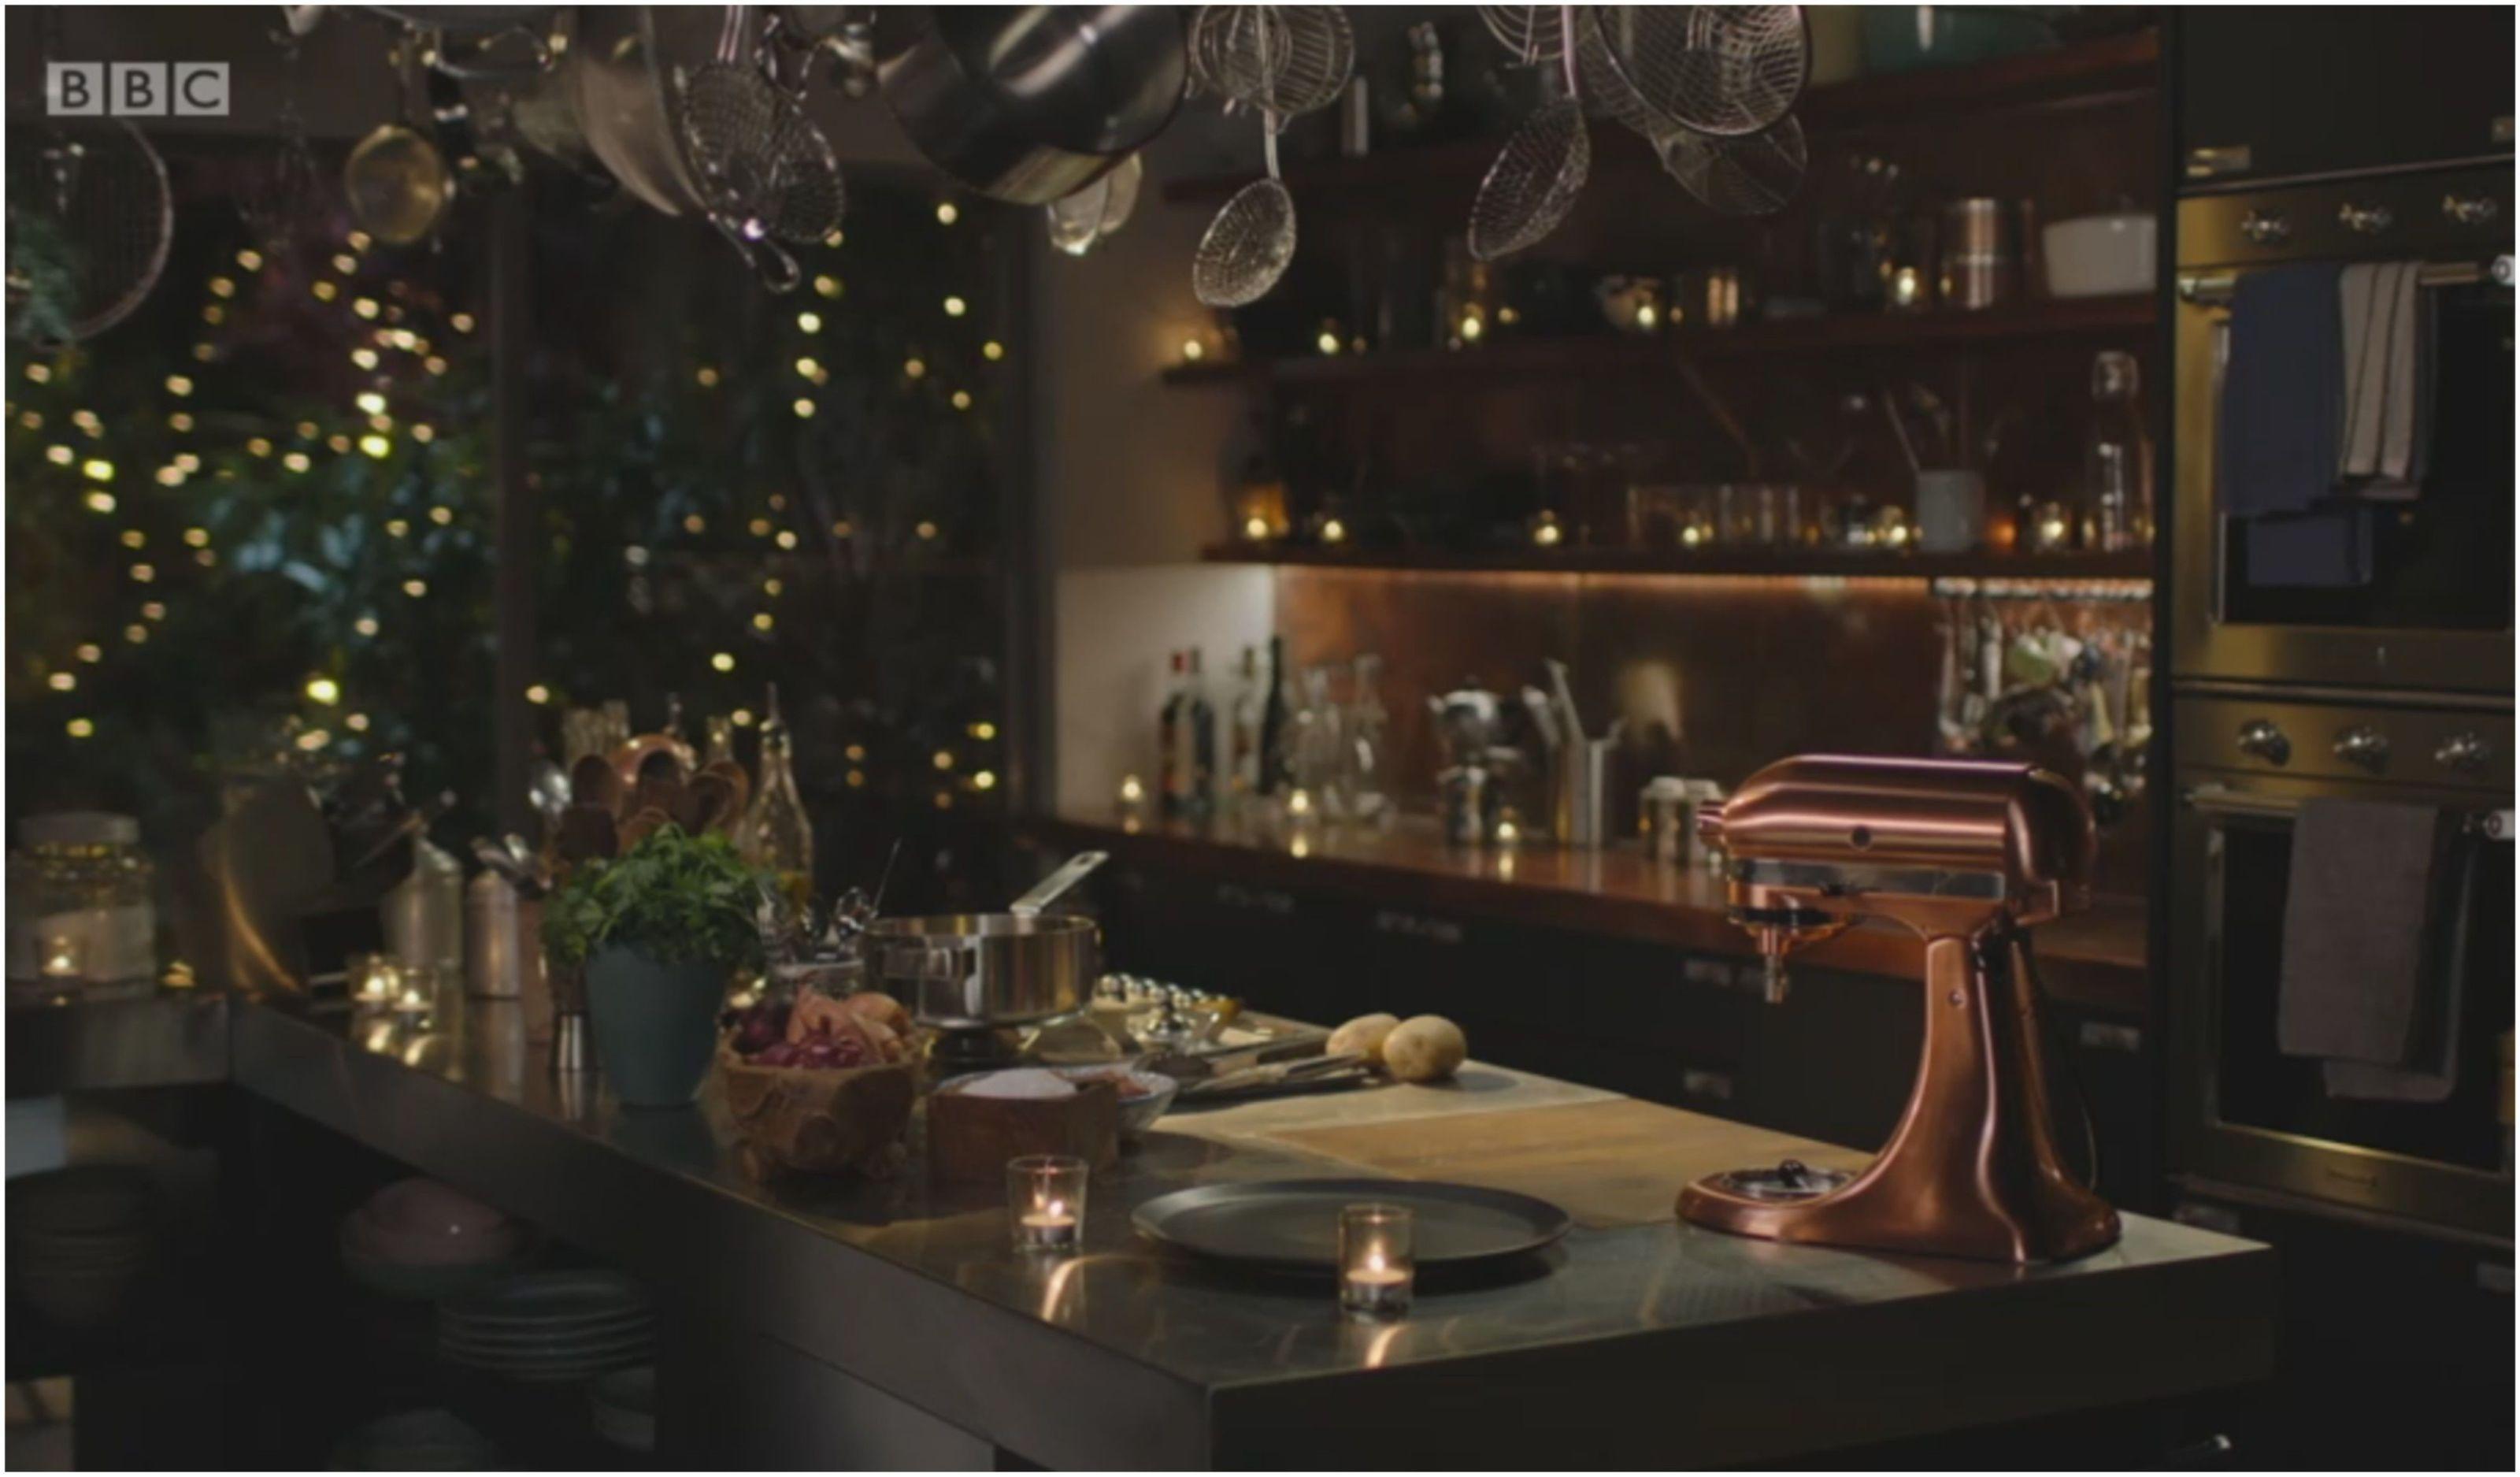 kitchen aid tv offer mobile home where to buy nigella lawson's copper kitchenaid stand ...